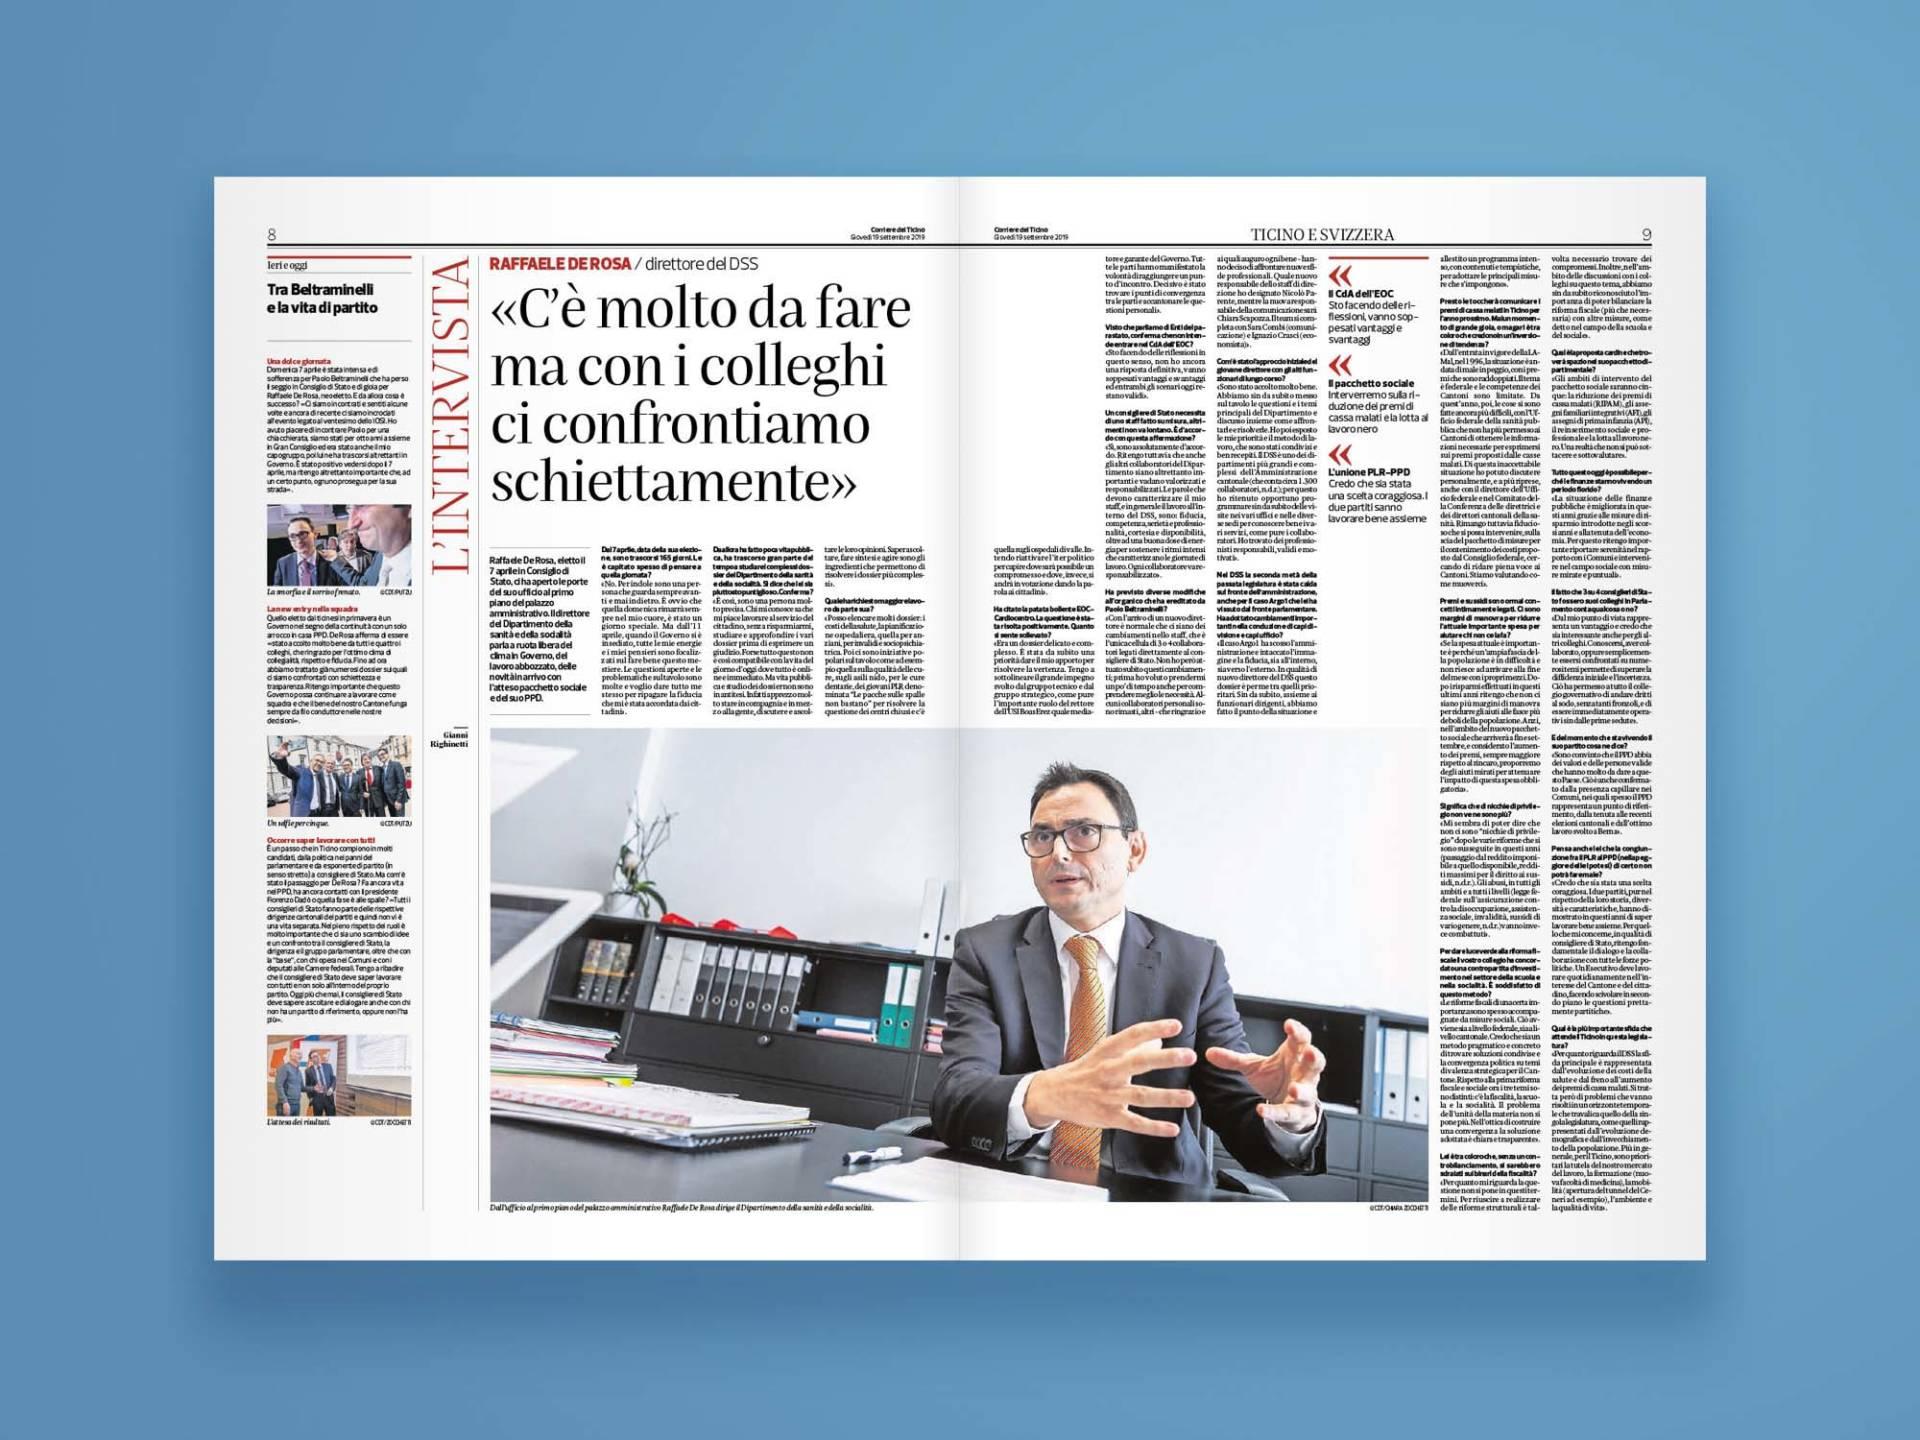 Corriere_Del_Ticino_06_Wenceslau_News_Design